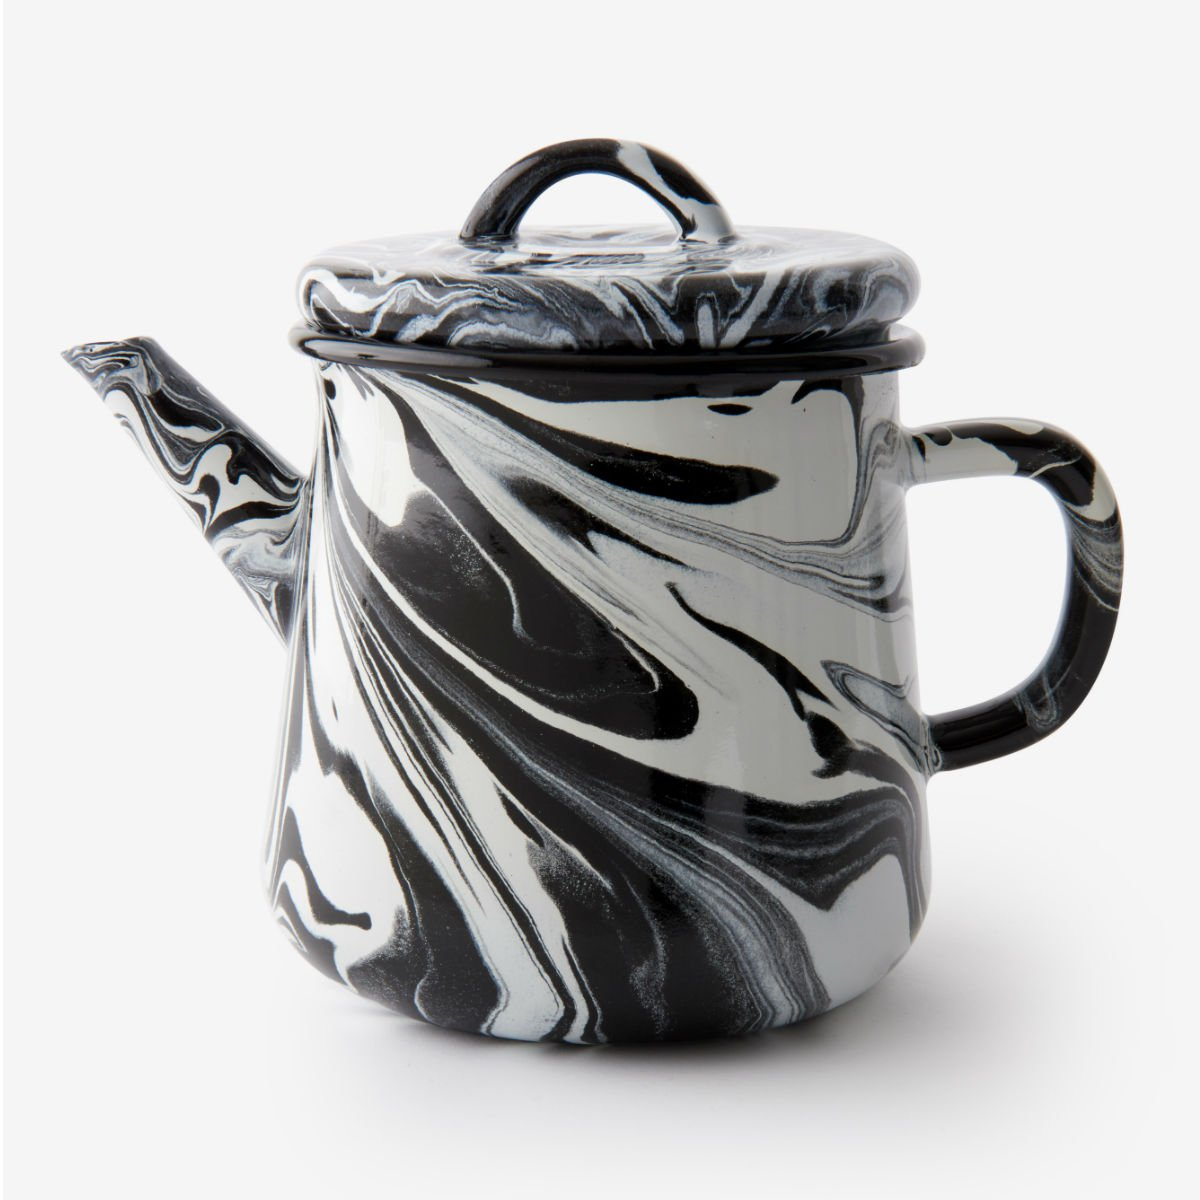 Černá čajová konvice BORNN